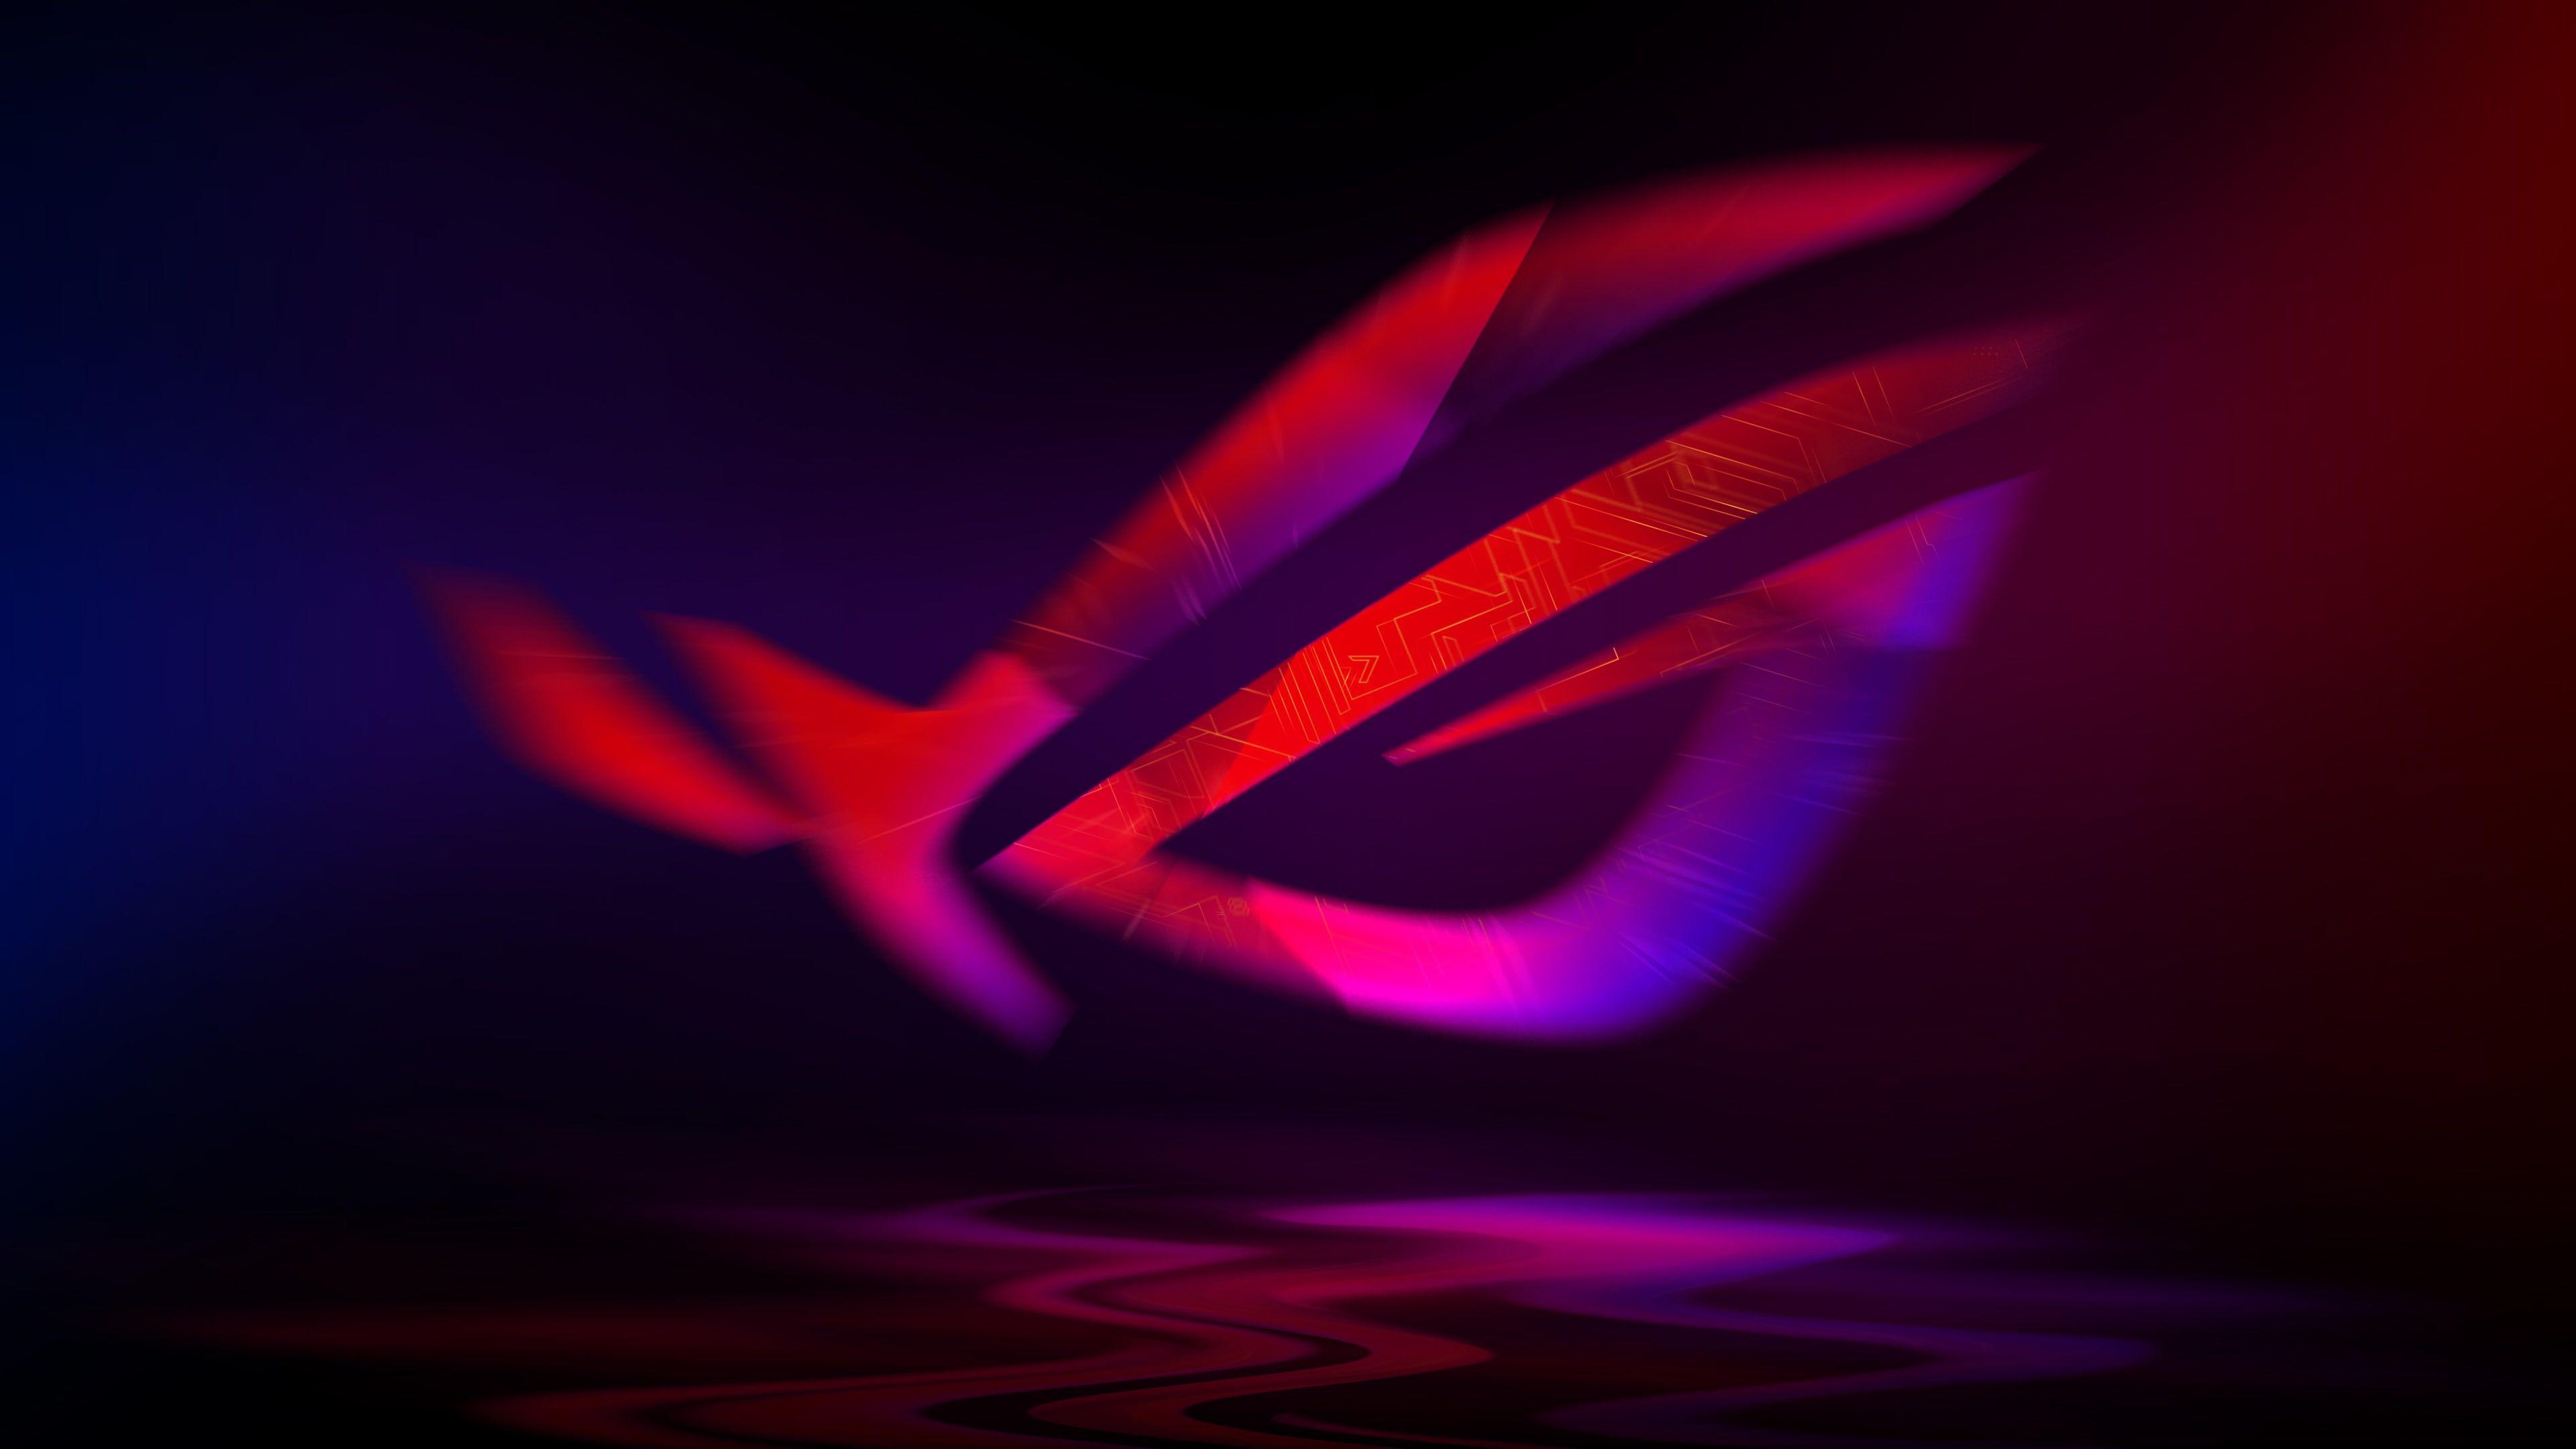 ASUS ROG Neon 4K 4K wallpaper hdwallpaper desktop in